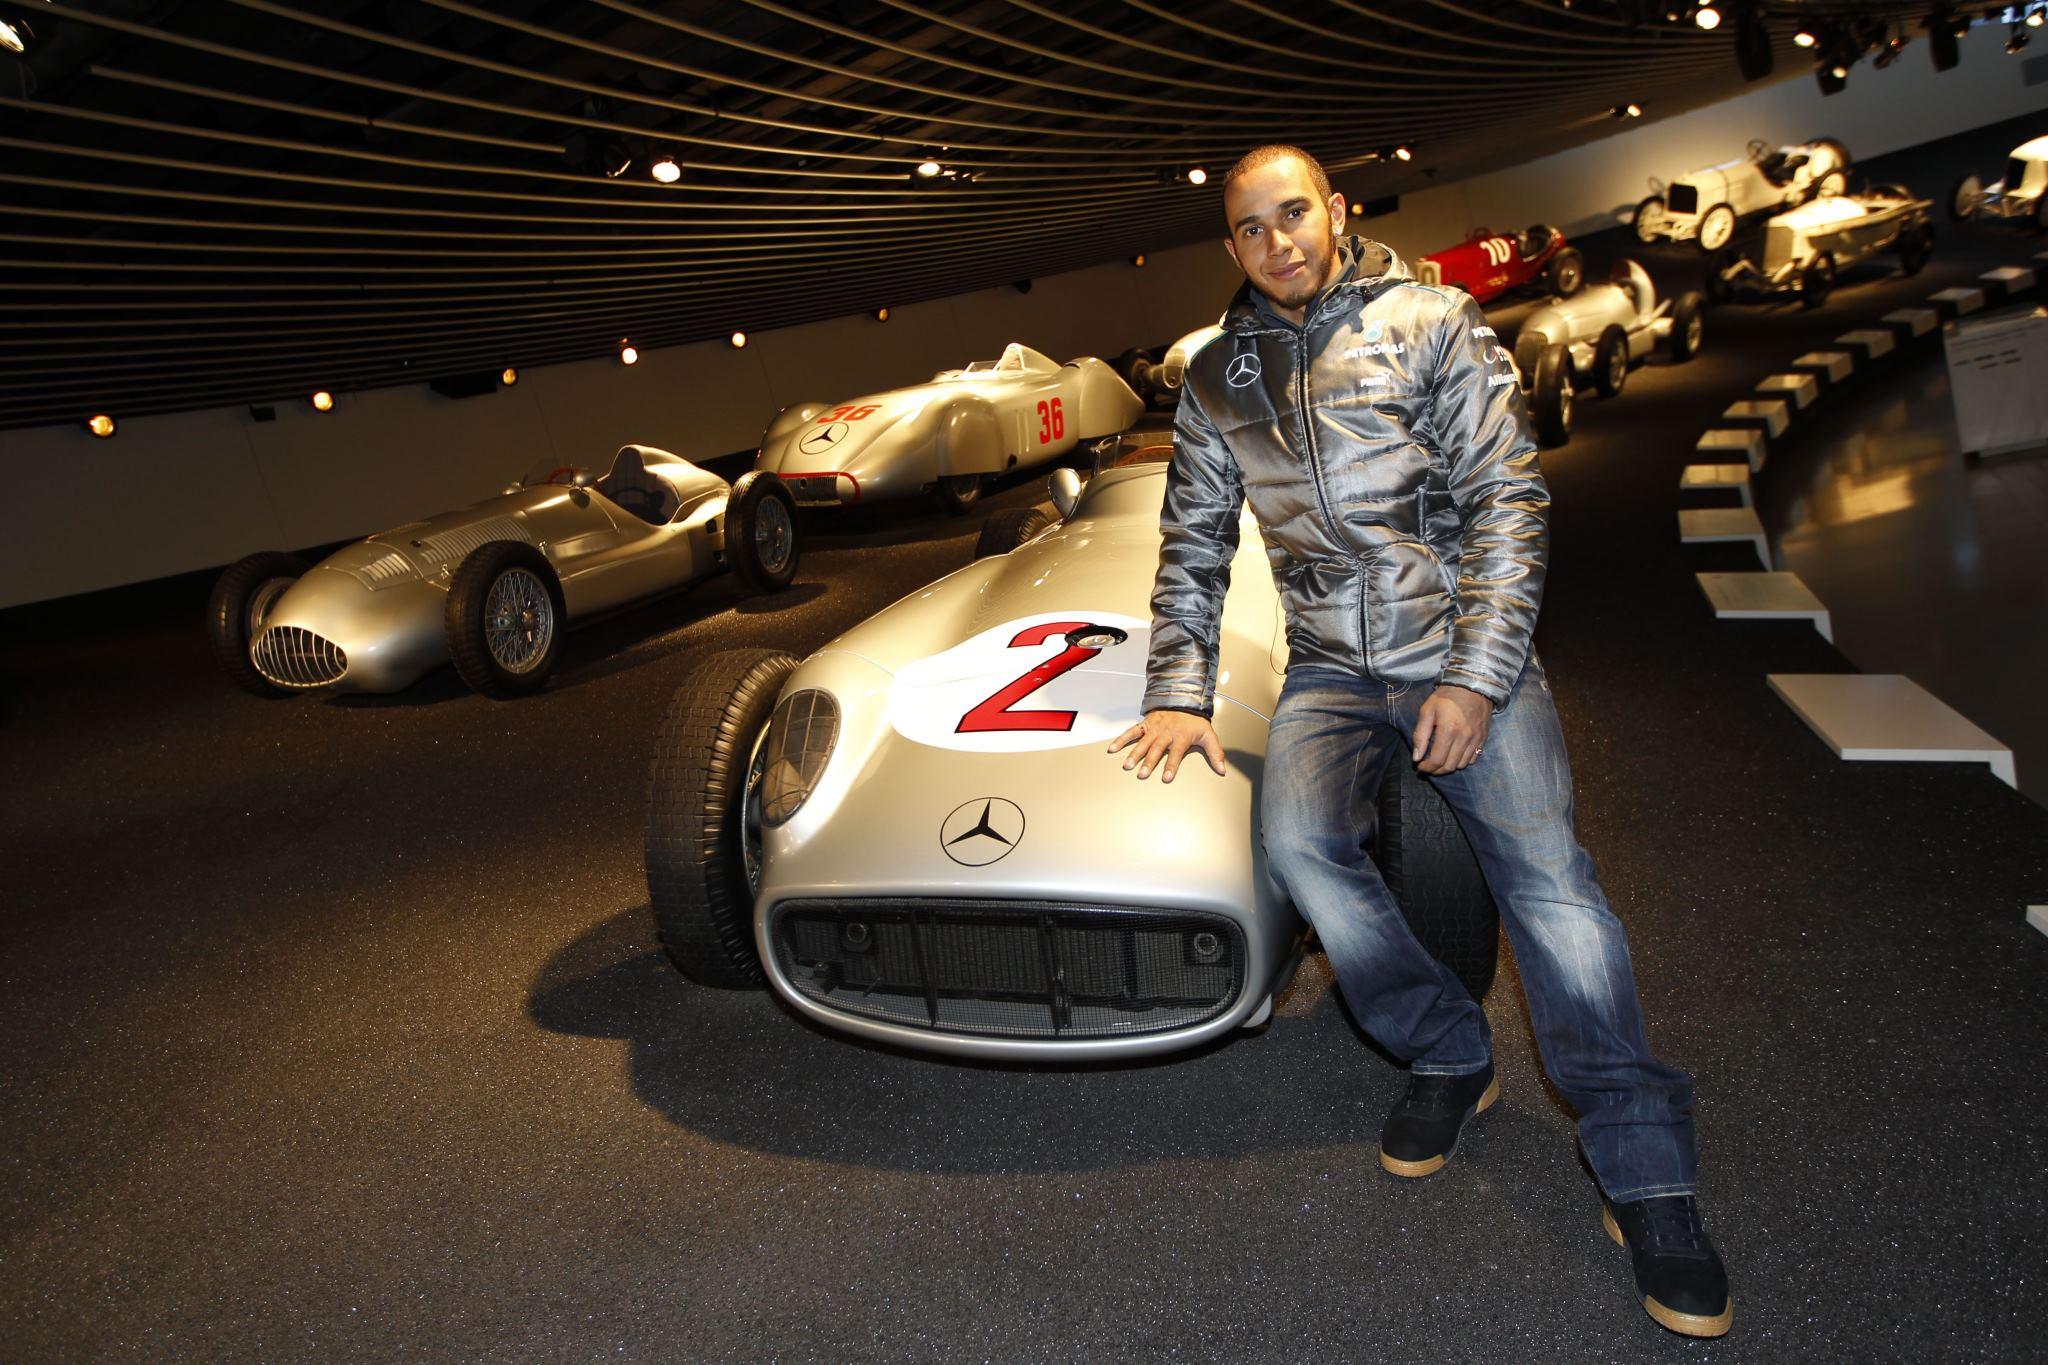 Lewis Hamilton Makes First Appearance as a Silver Arrow Driver stuttgart museum